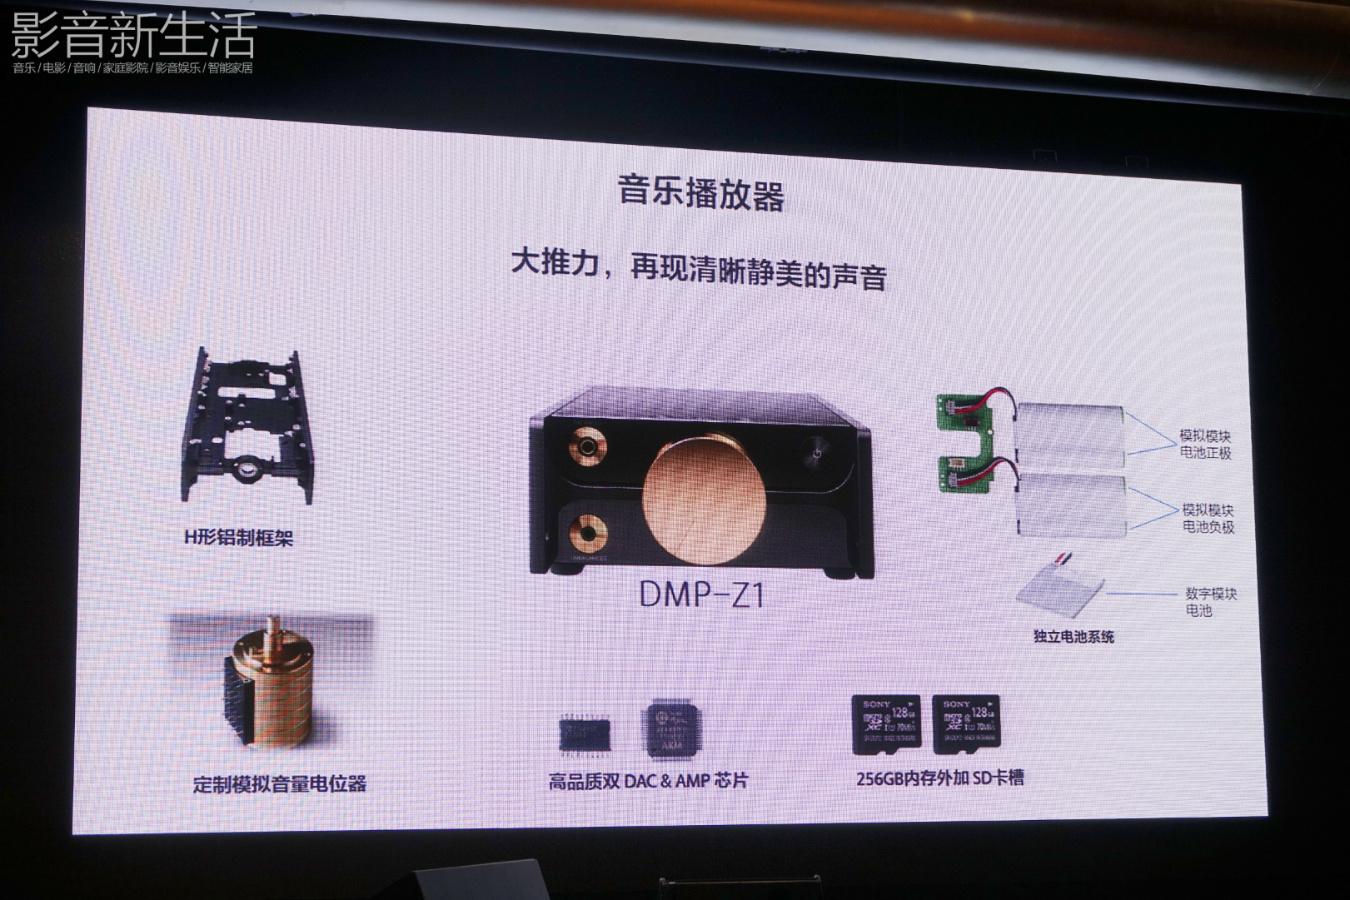 "Sony Hi Res 2018 20 - 新品 | ""重塑随身音乐娱乐王朝!"":Sony索尼发布Signature醇音系列新兄弟IER-Z1R和DMP-Z1,以及舞台监听耳机系列:IER-M7和IER-M9,还有升级款MDR-Z7M2!"